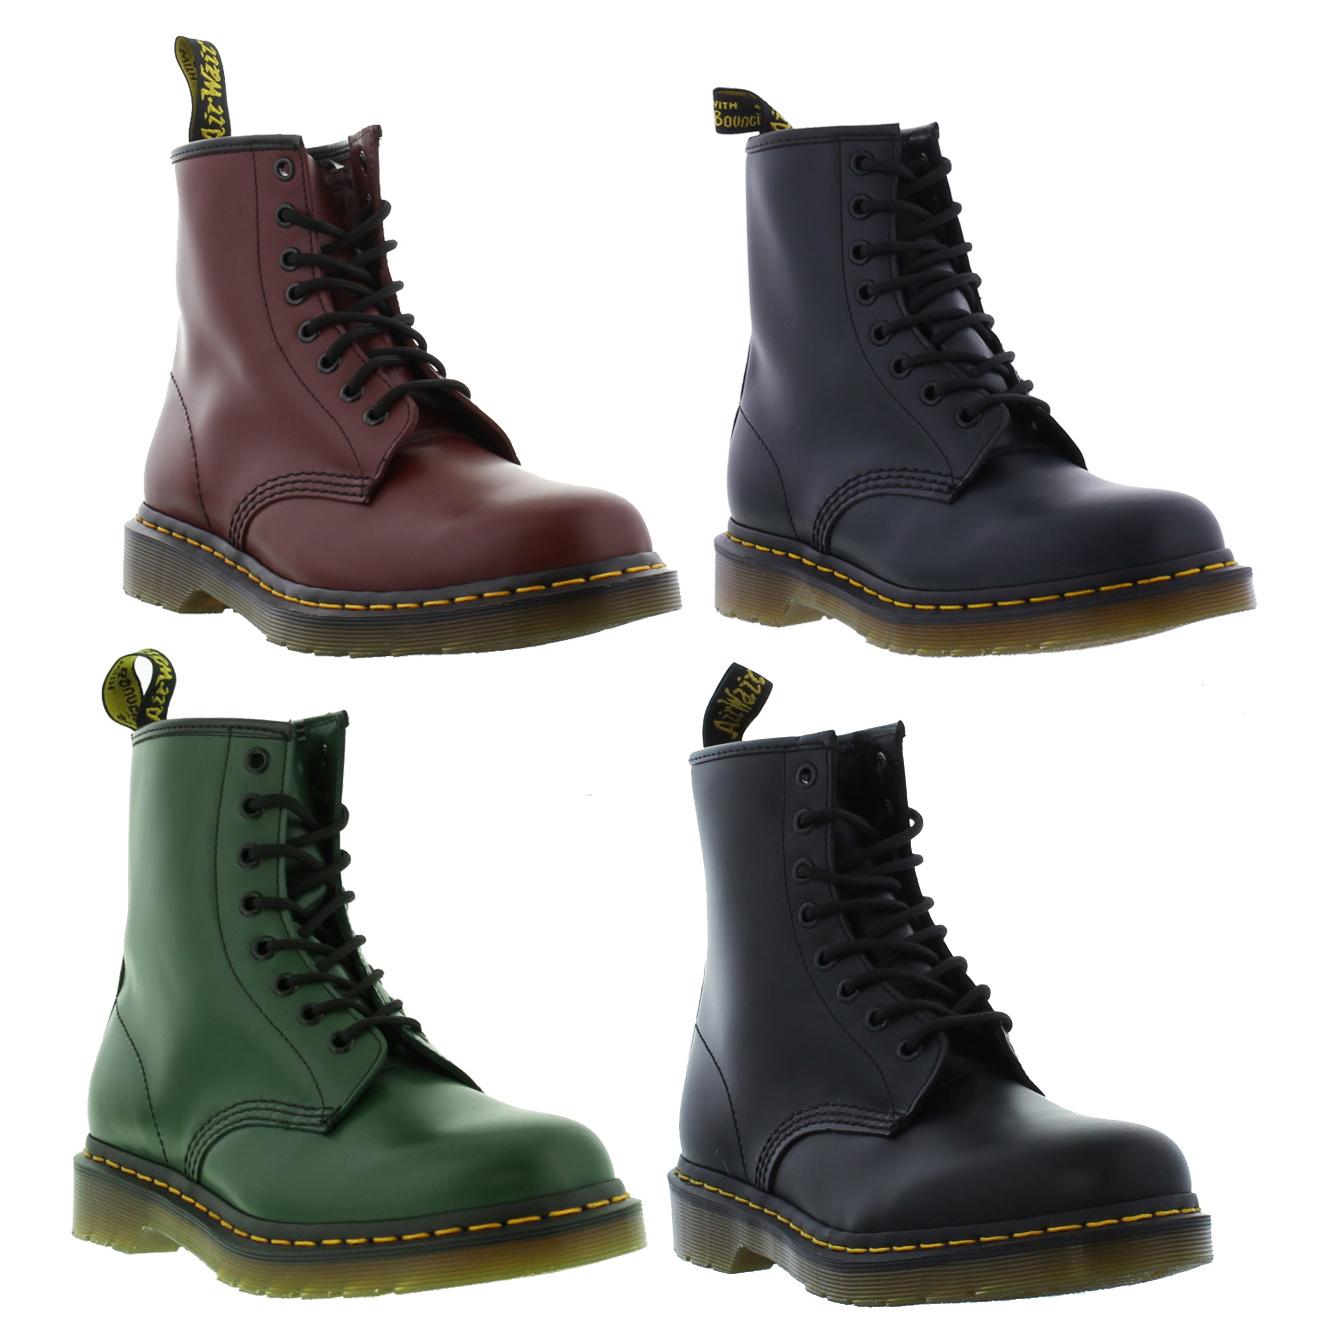 dr martens 1460 z mens womens leather ankle boots size 3. Black Bedroom Furniture Sets. Home Design Ideas